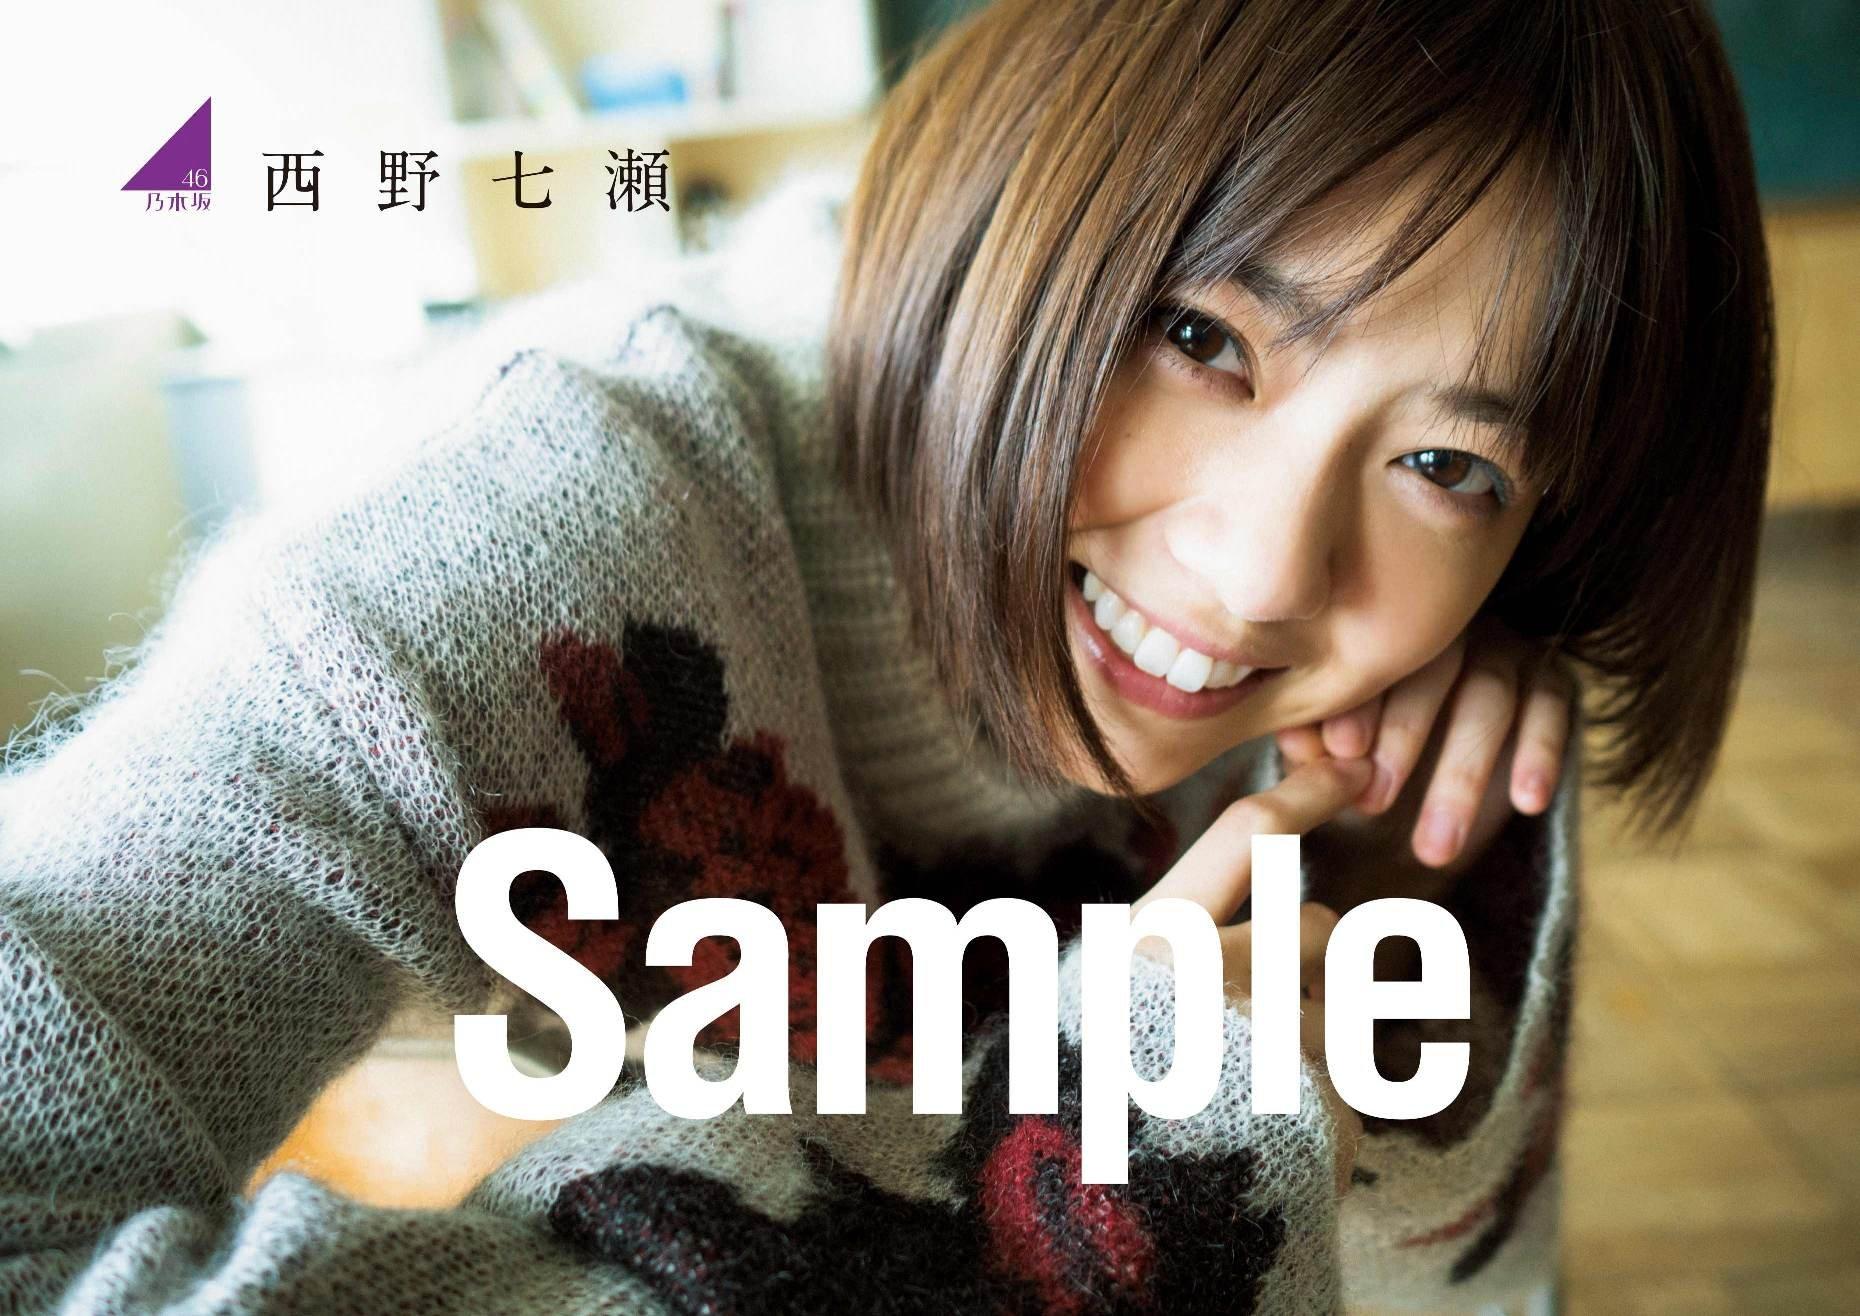 EX (イーエックス) 大衆 2018年3月号 西野七瀬4